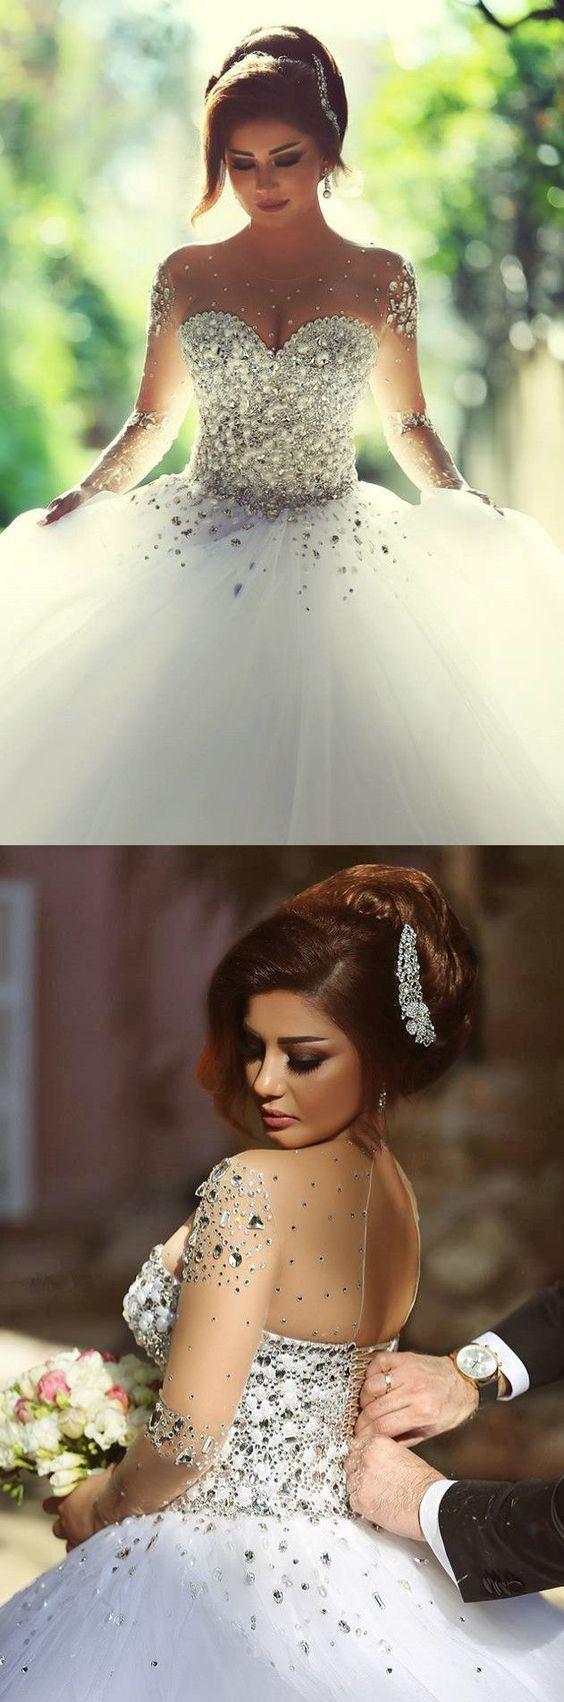 Wedding Dress,Wedding Dresses,Long Sleeve Crystal Ball Gown Wedding